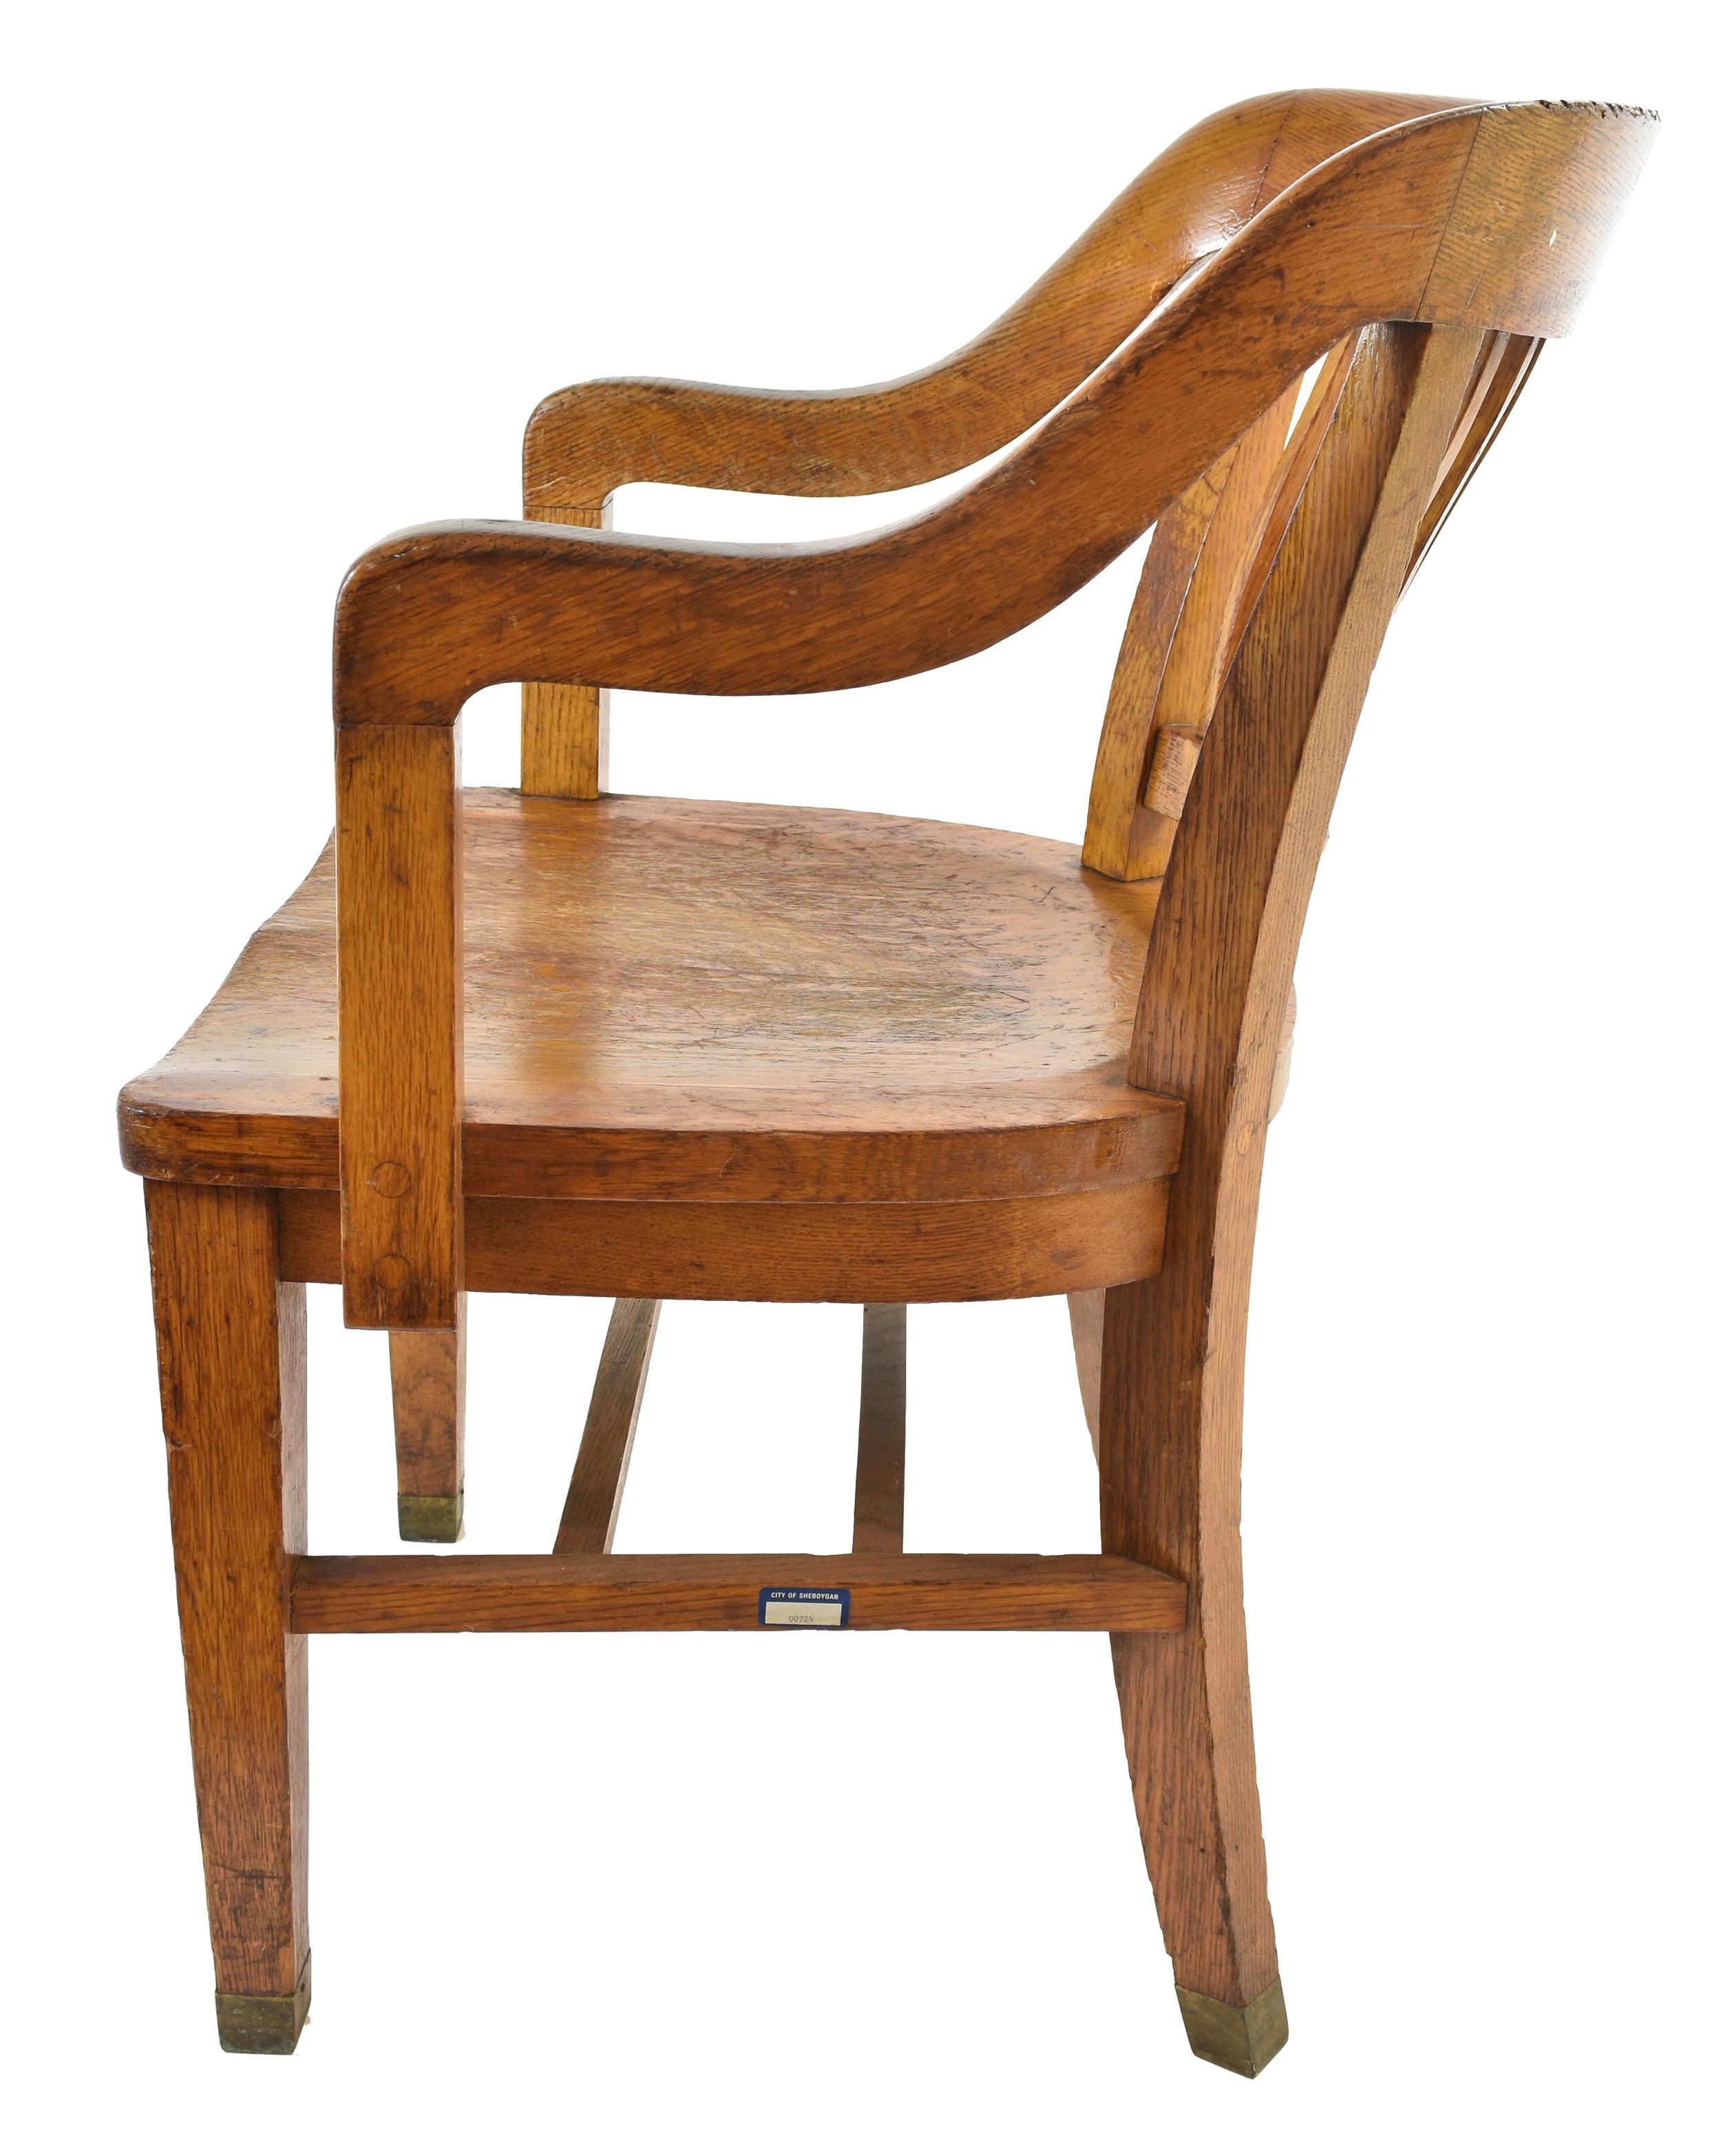 47978 courtroom oak chairs 1.jpg